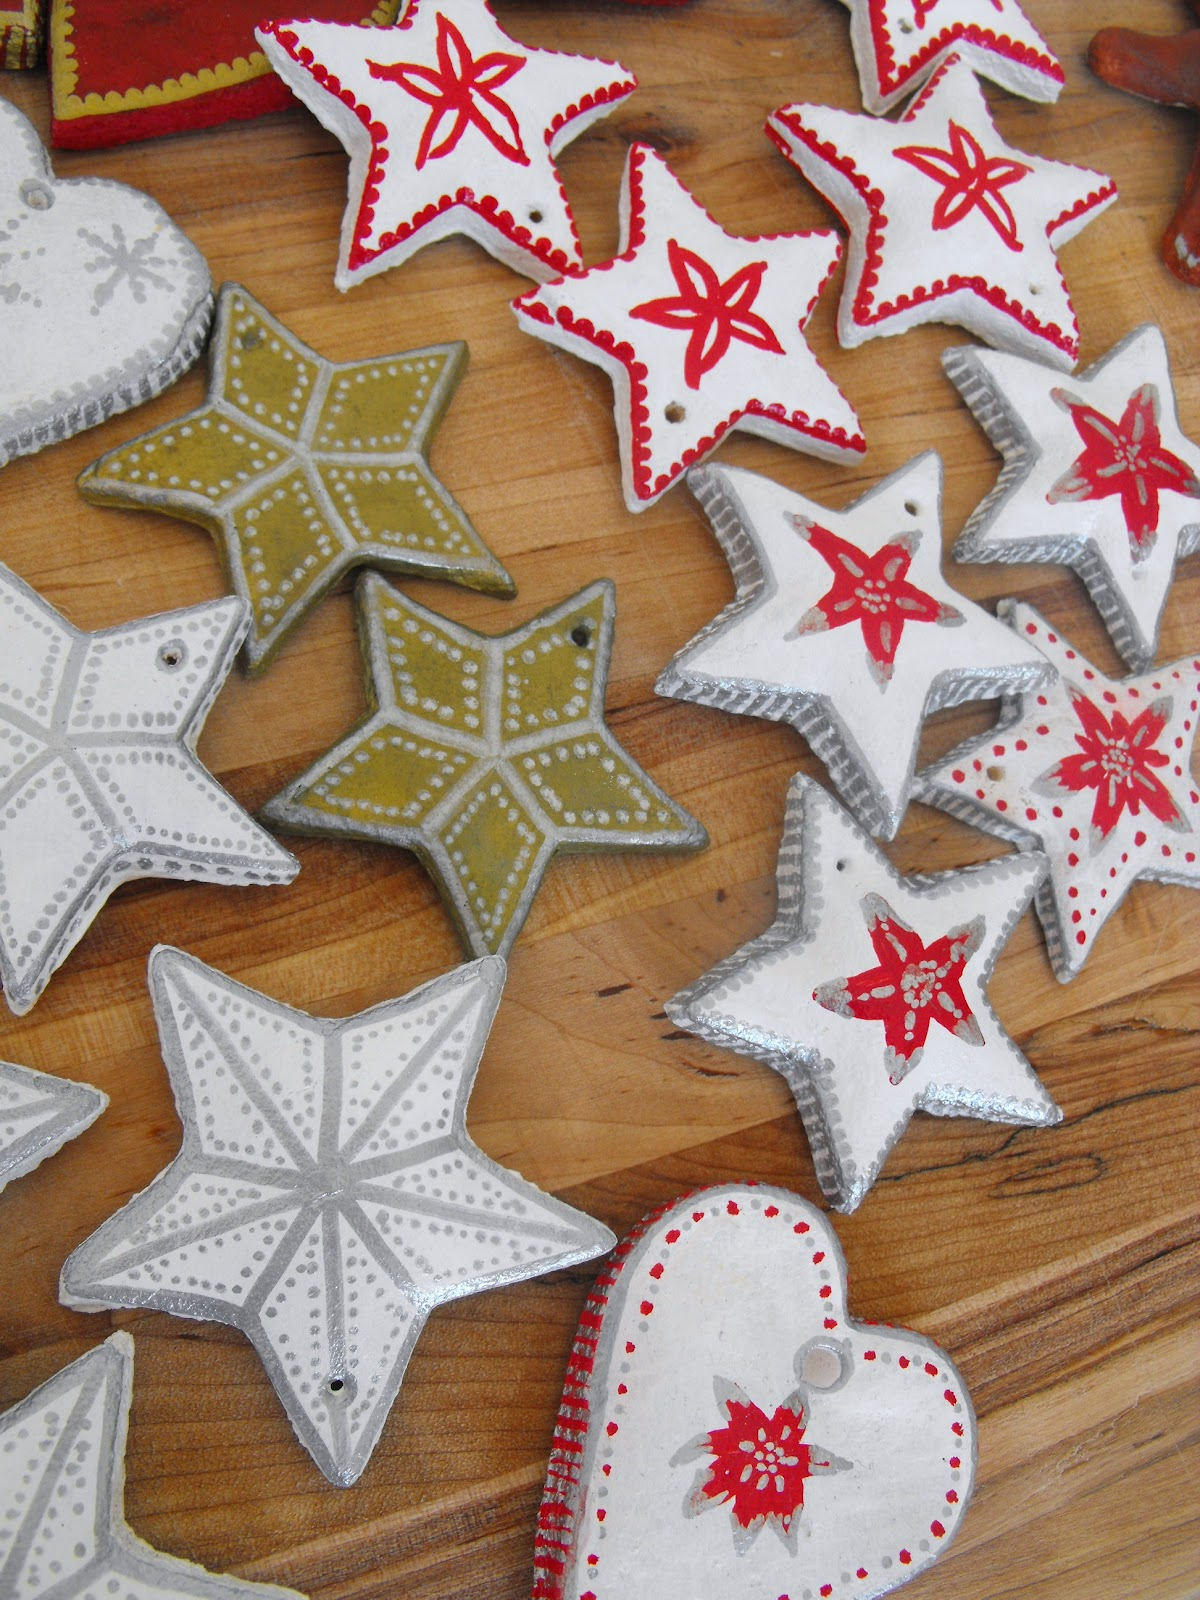 How To Make Christmas Tree Ornaments With Dough : Ruby murrays musings salt dough christmas tree ornaments